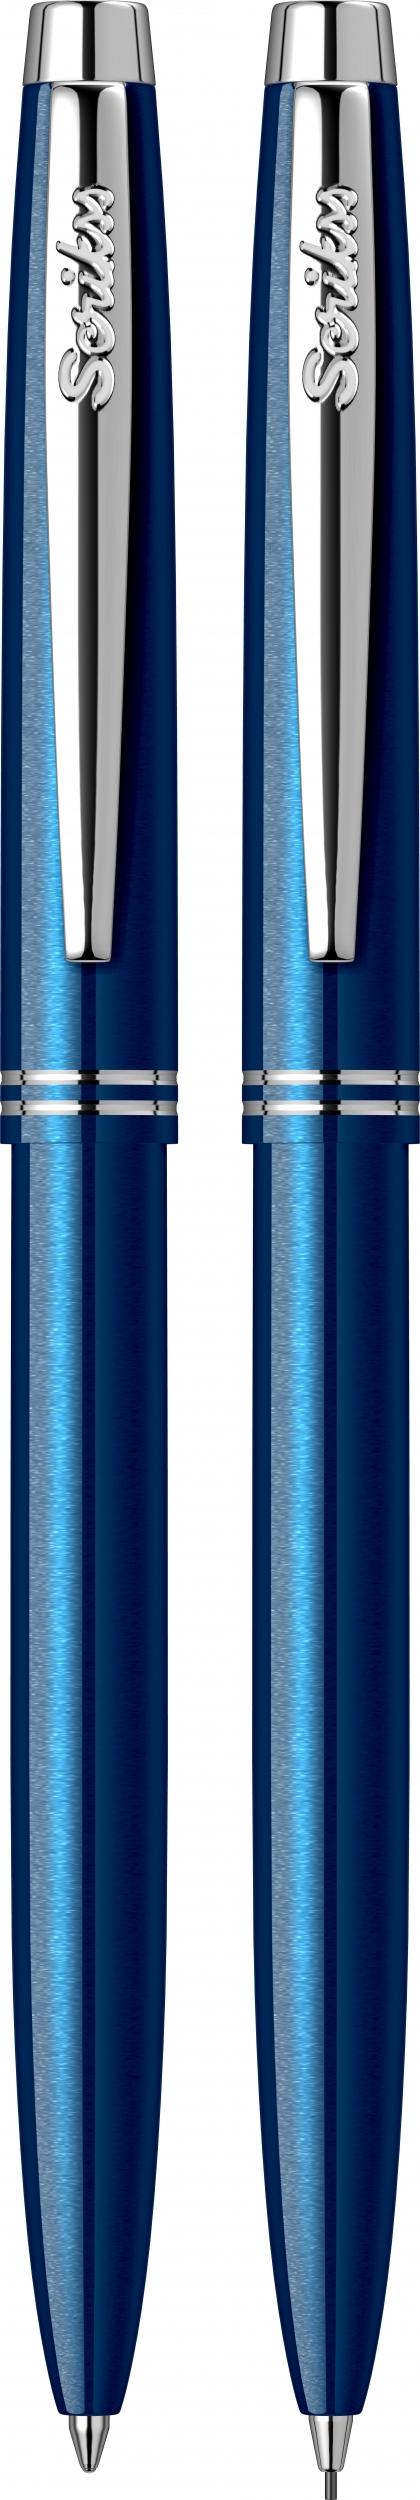 Двоен комплект Автоматична химикалка + Автоматичен молив  Scrikss, модел 81935,  Prestige 108  Син